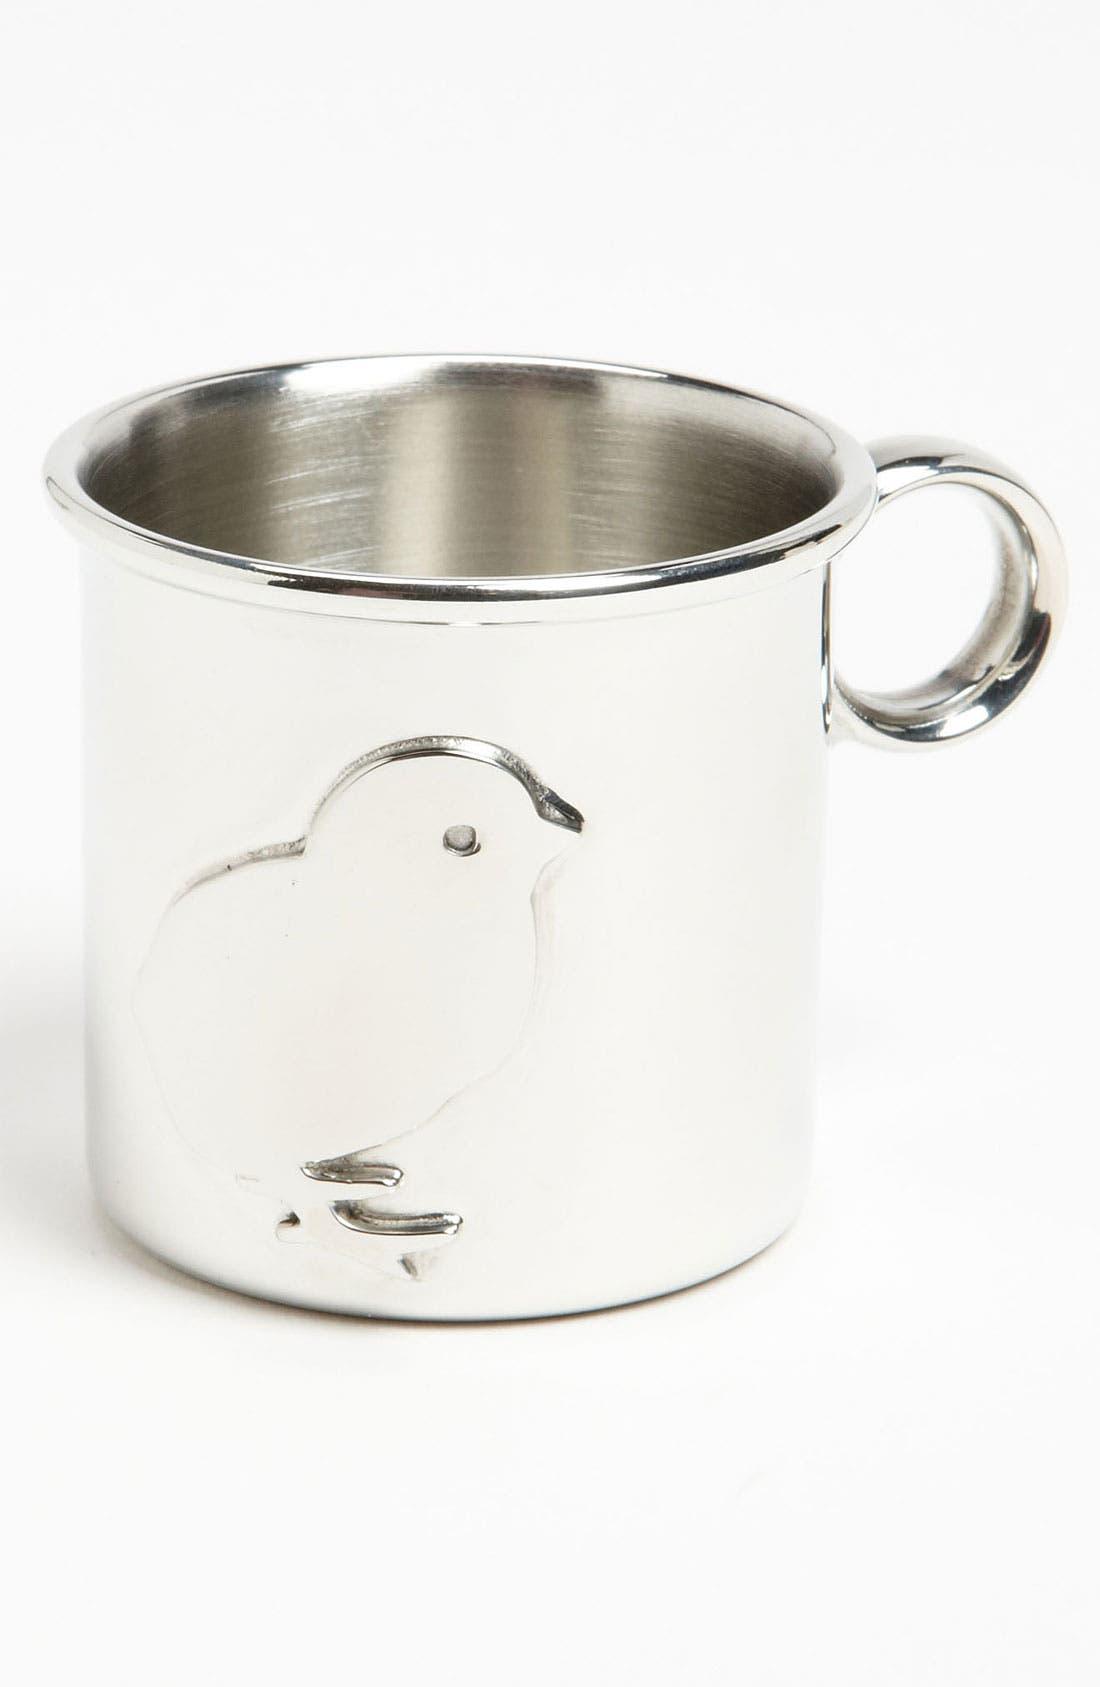 Main Image - Beehive Kitchenware 'Chick' Keepsake Cup